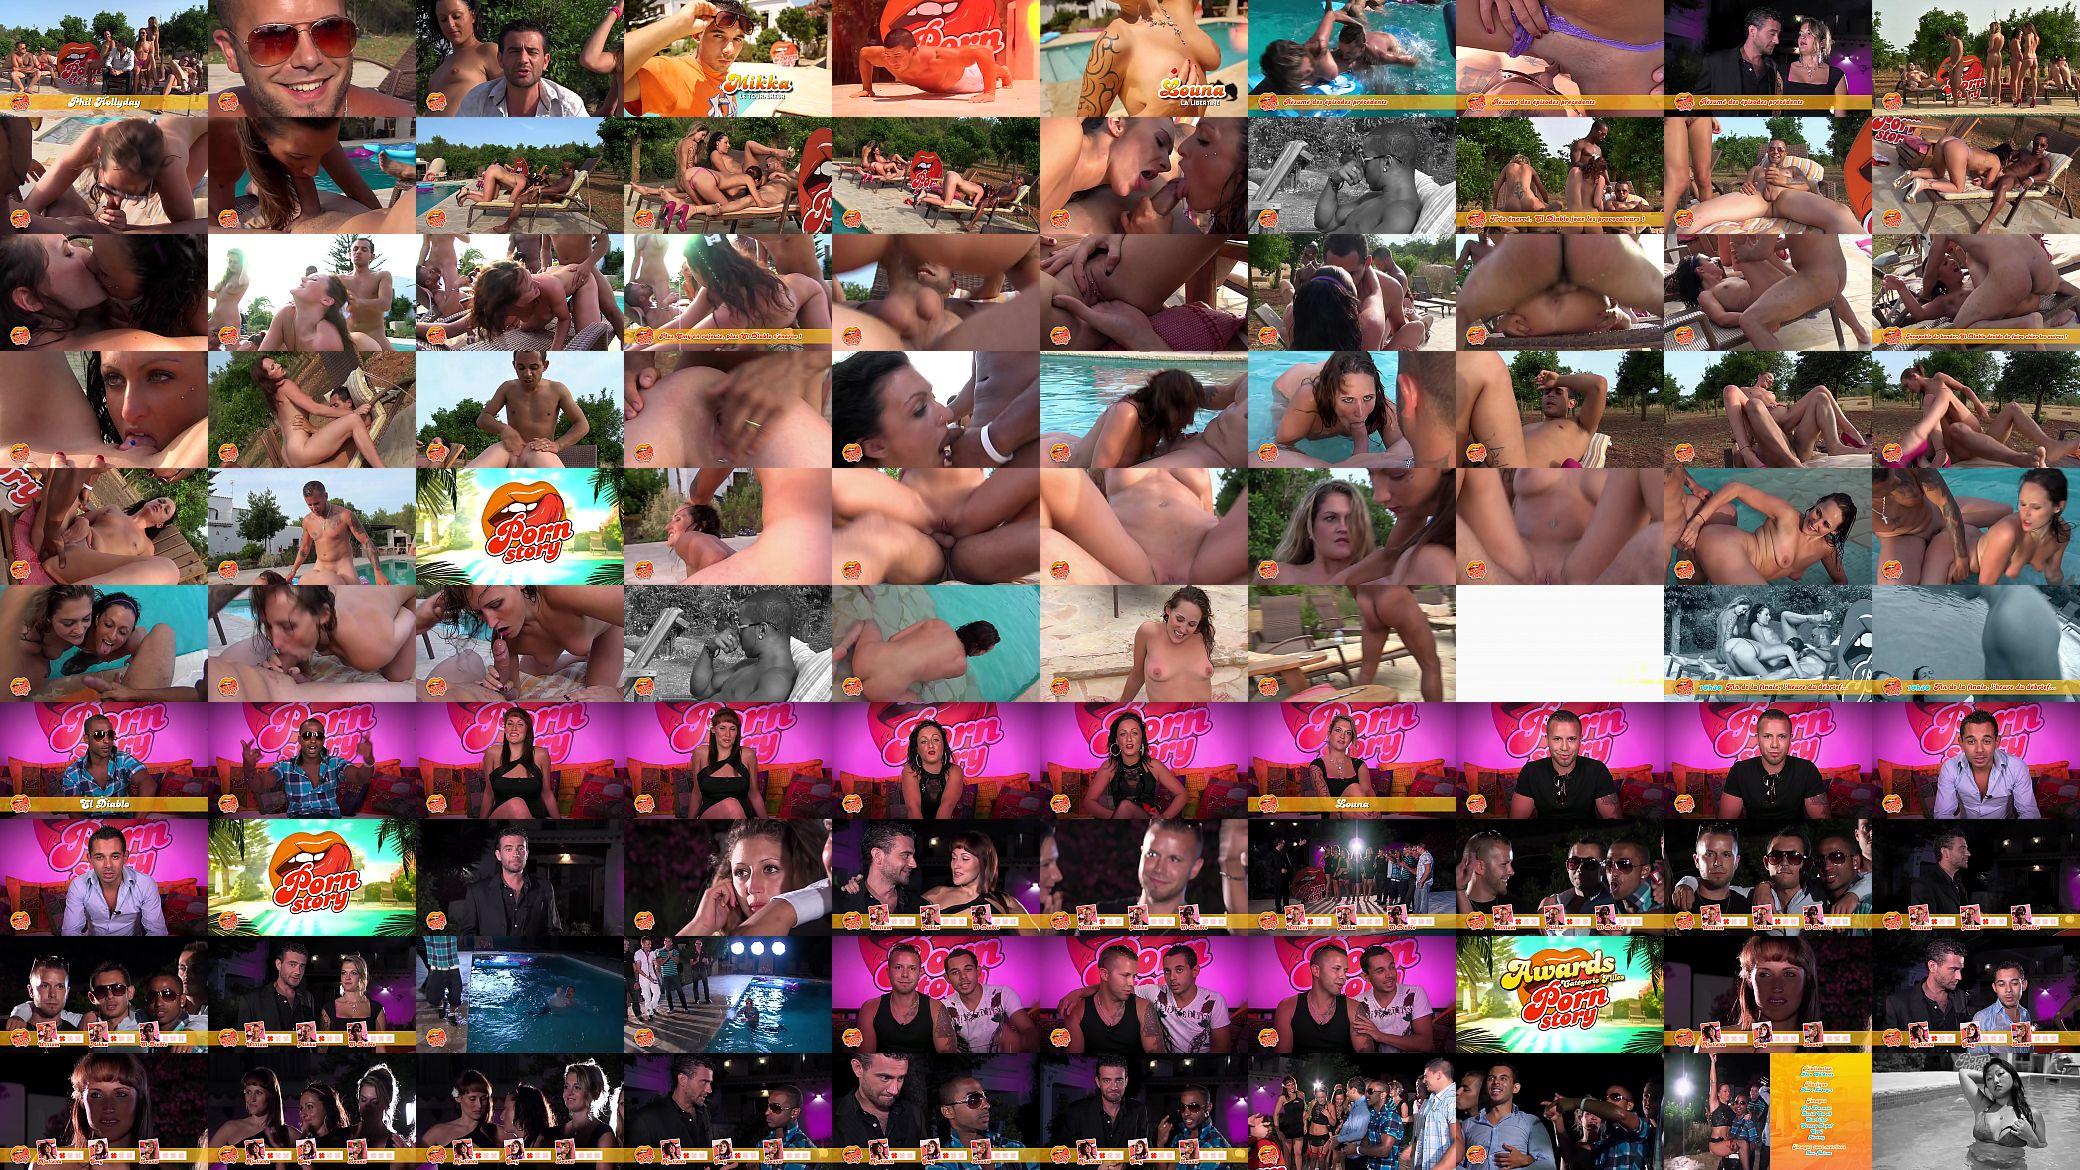 Adan Y Eva 1X10 Porn porn story - episode 11 - xnxx